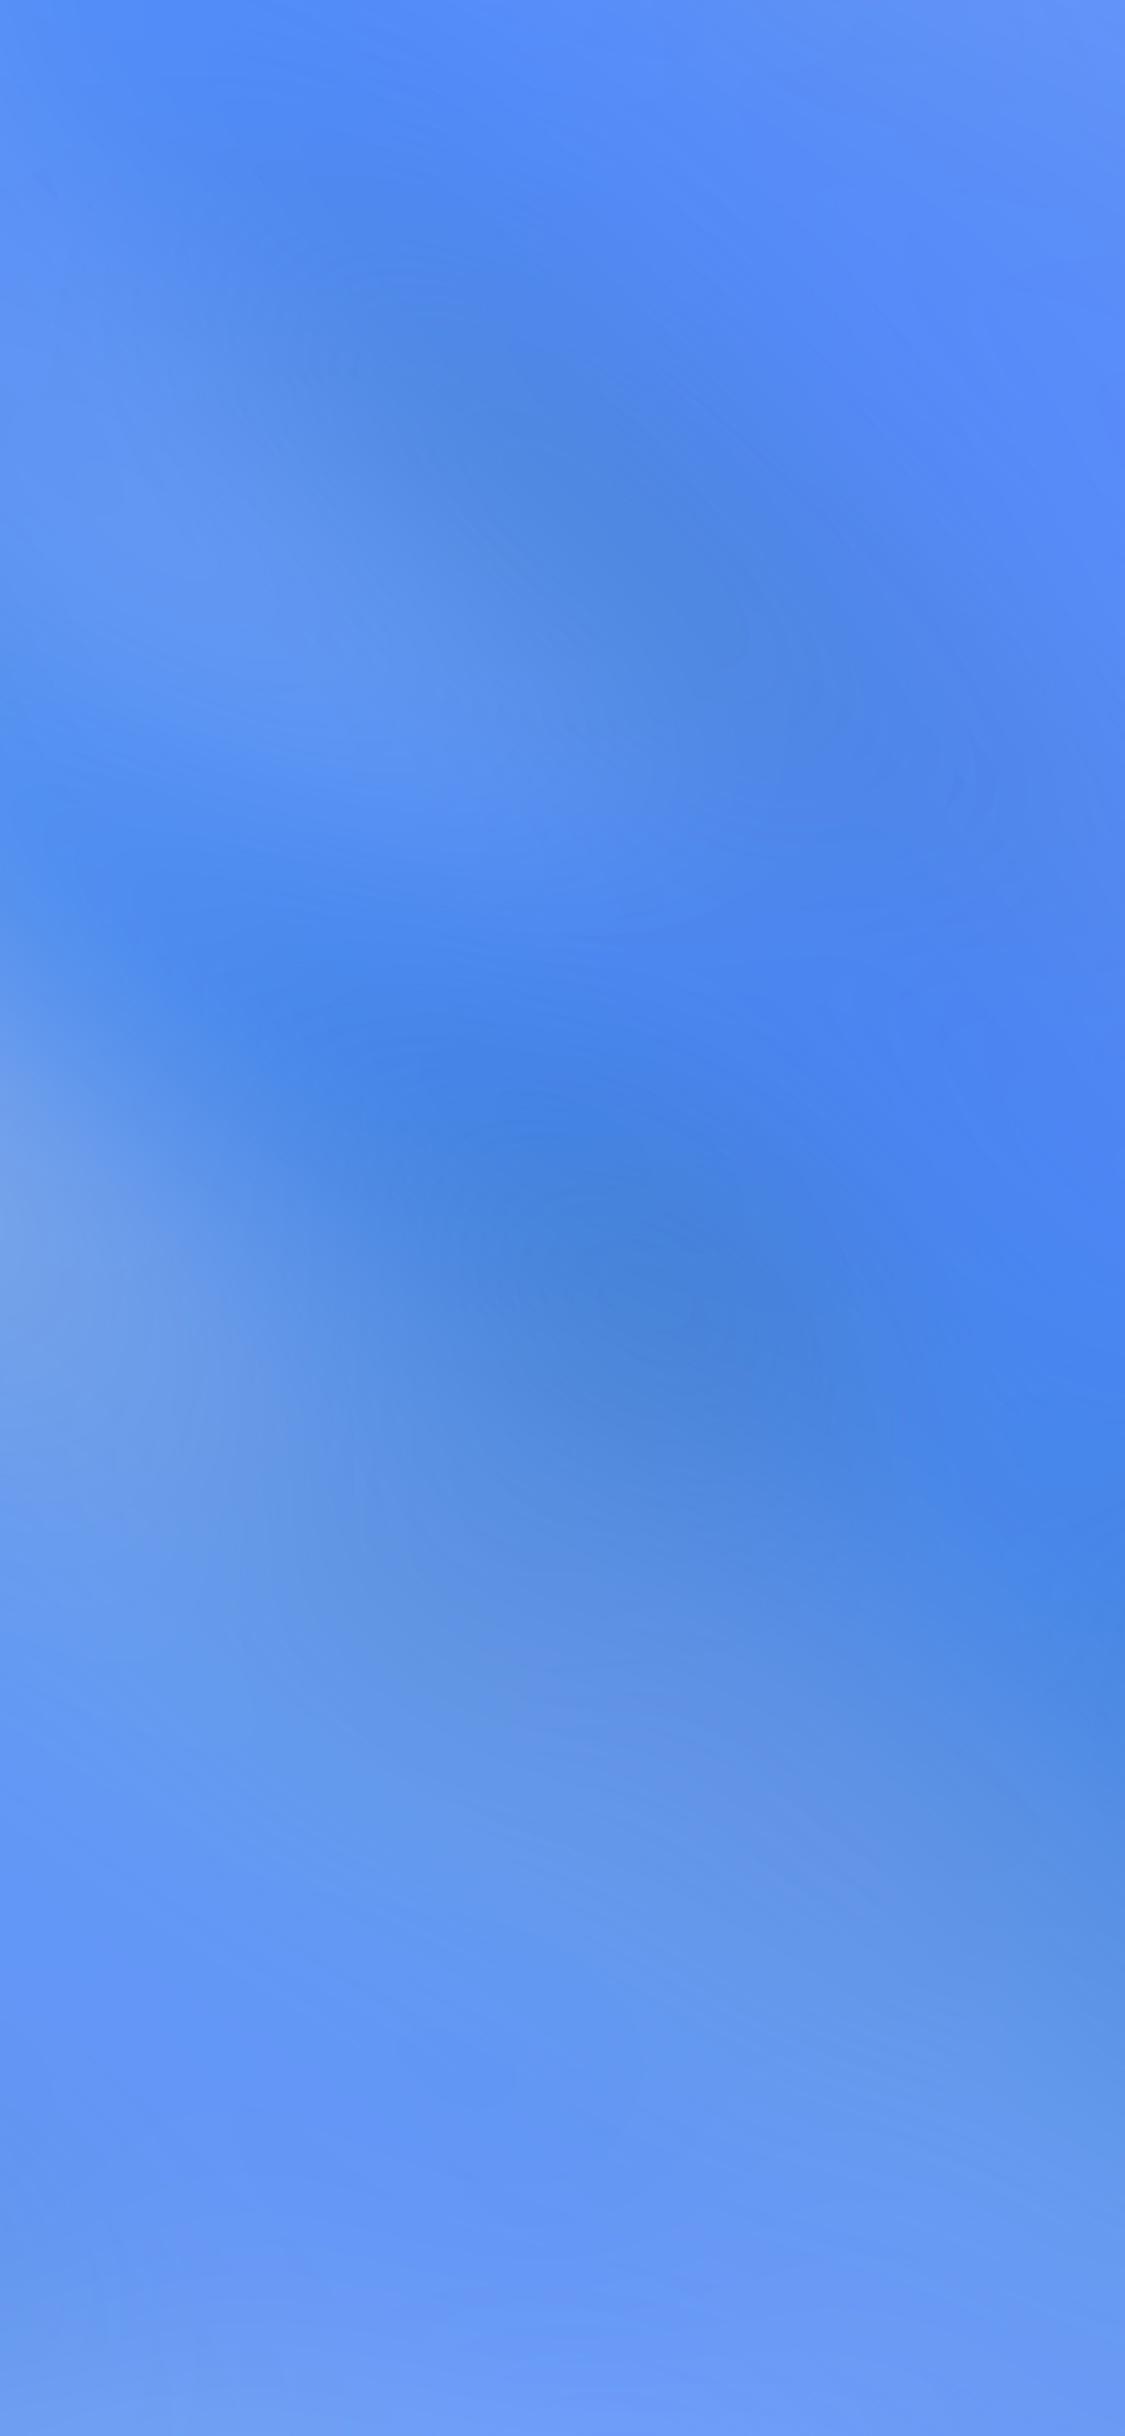 iPhoneXpapers.com | iPhone X wallpaper | sk92-blue-smoke-blur-gradation